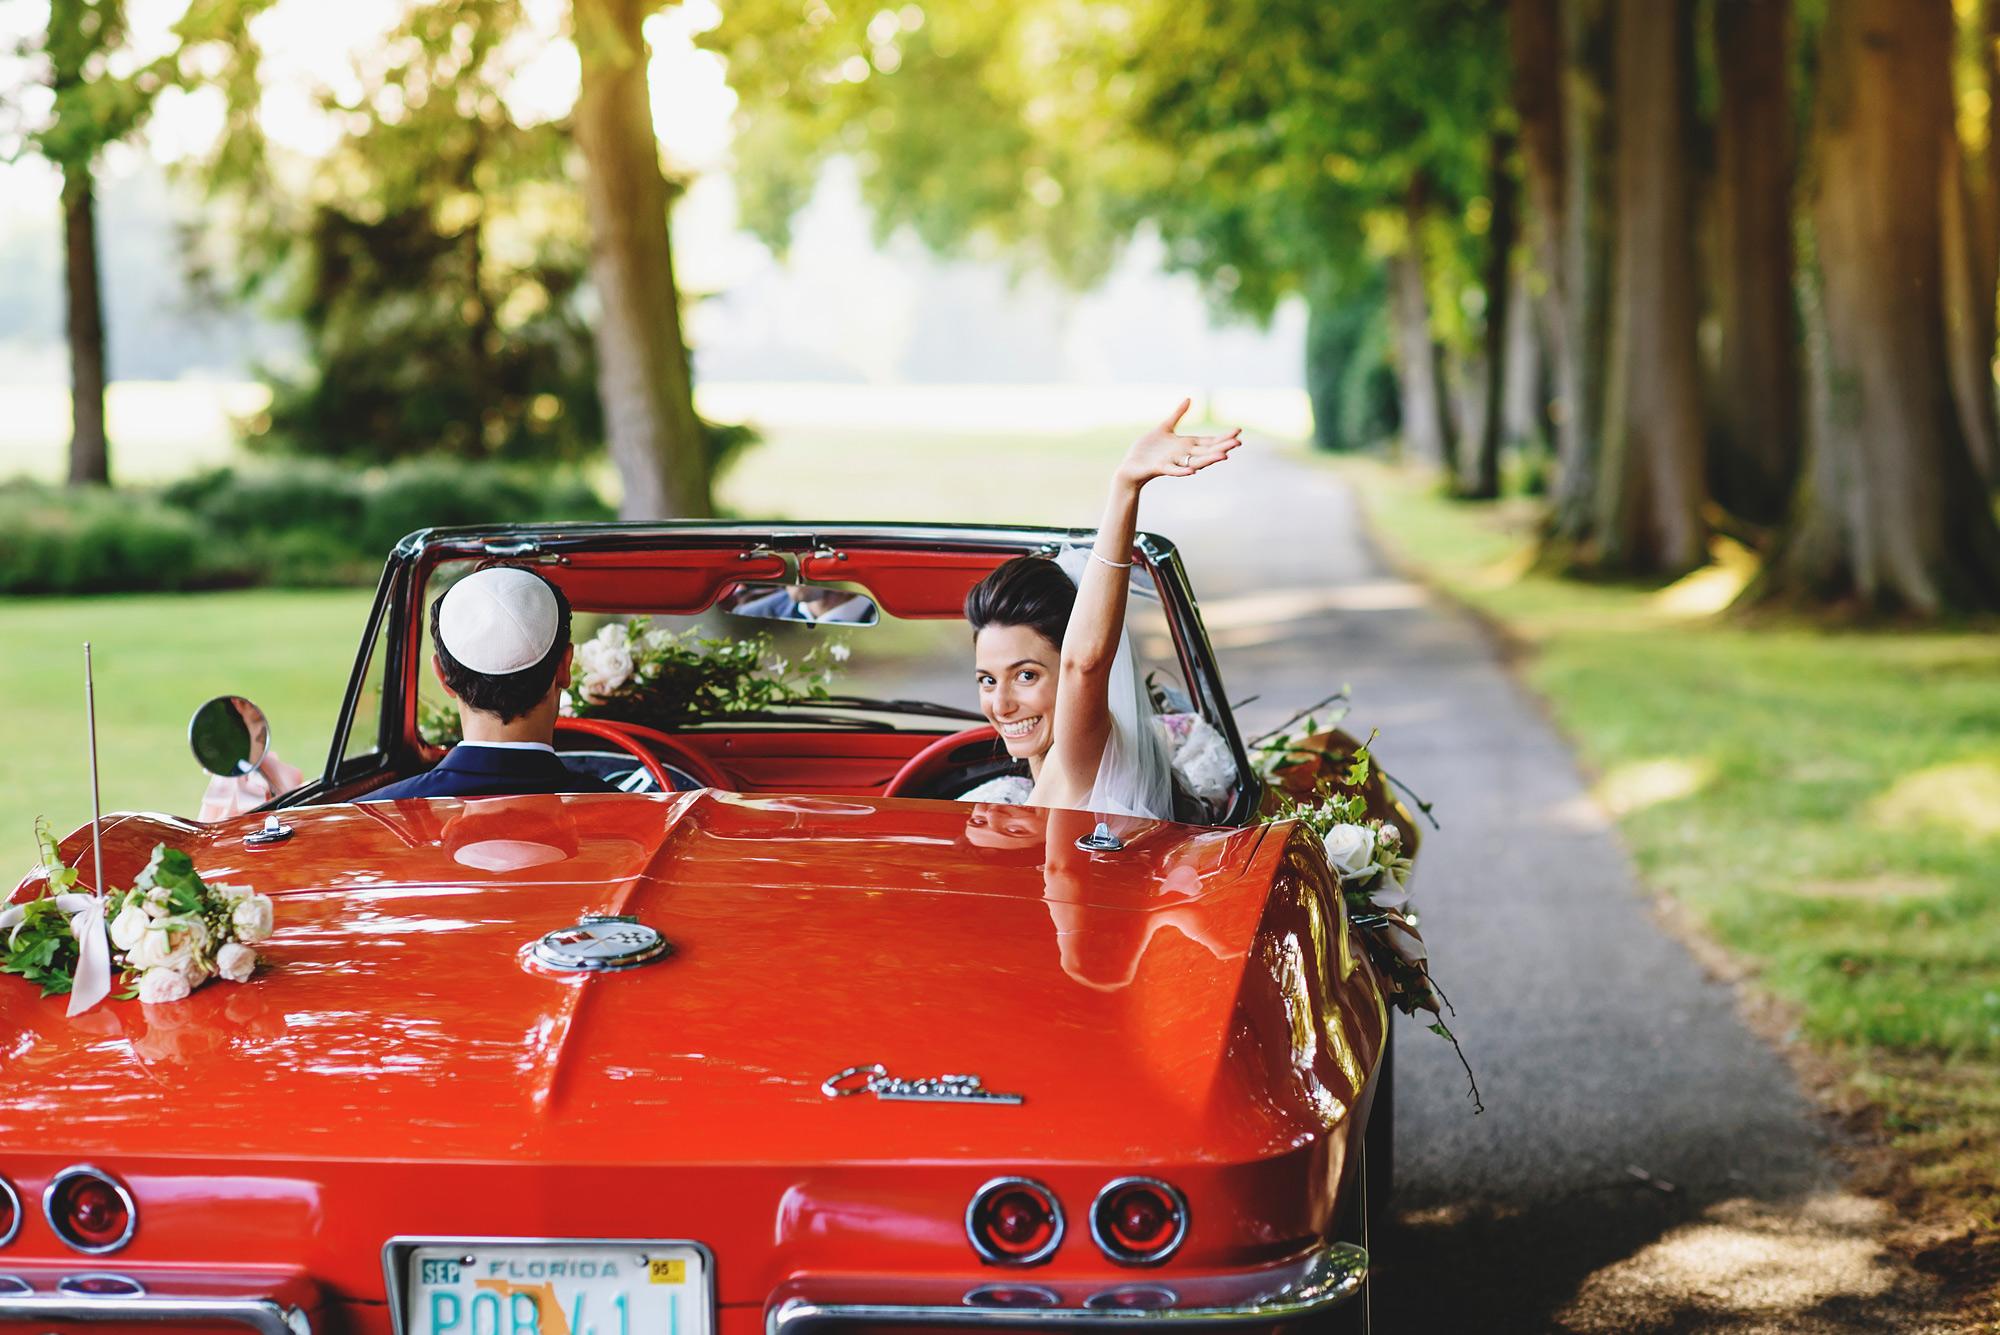 couple-leaves-ceremony-in-little-red-corvette-worlds-best-wedding-photos-ross-harvey-london-wedding-photographers